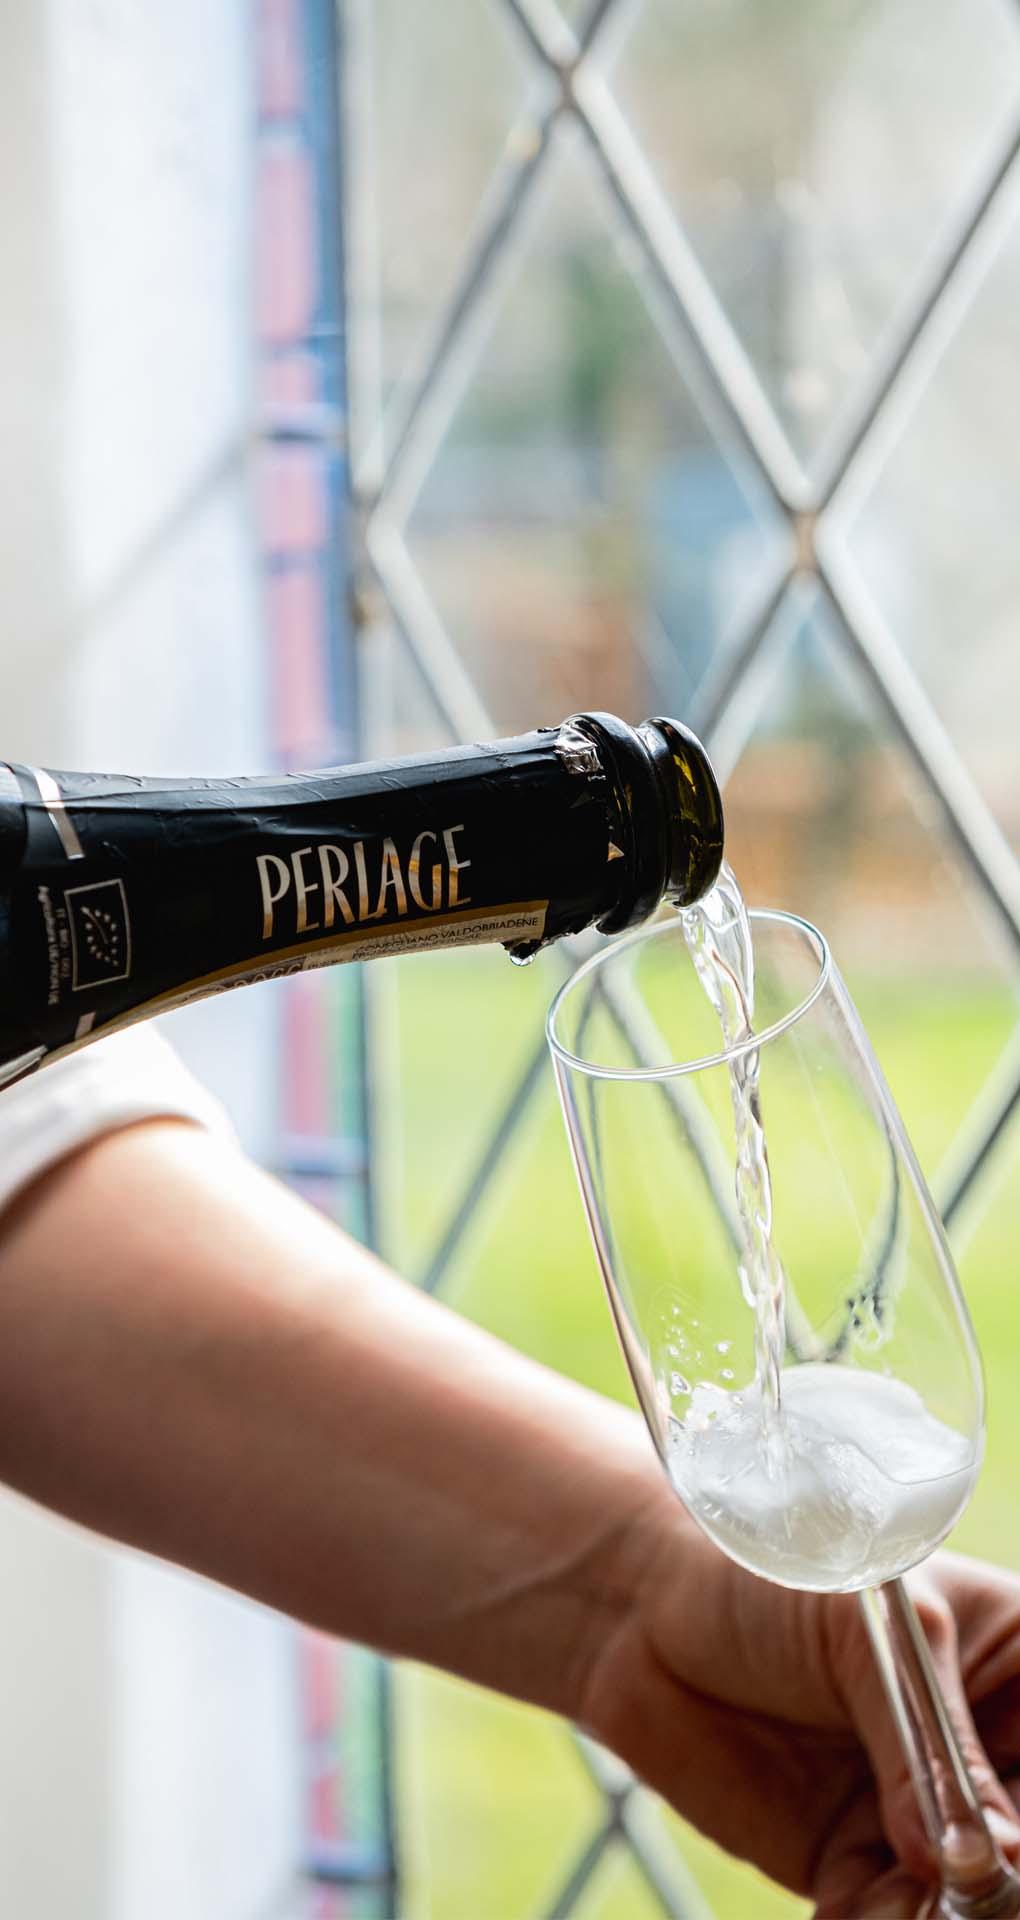 Bubbels champagne glas in lood schenken